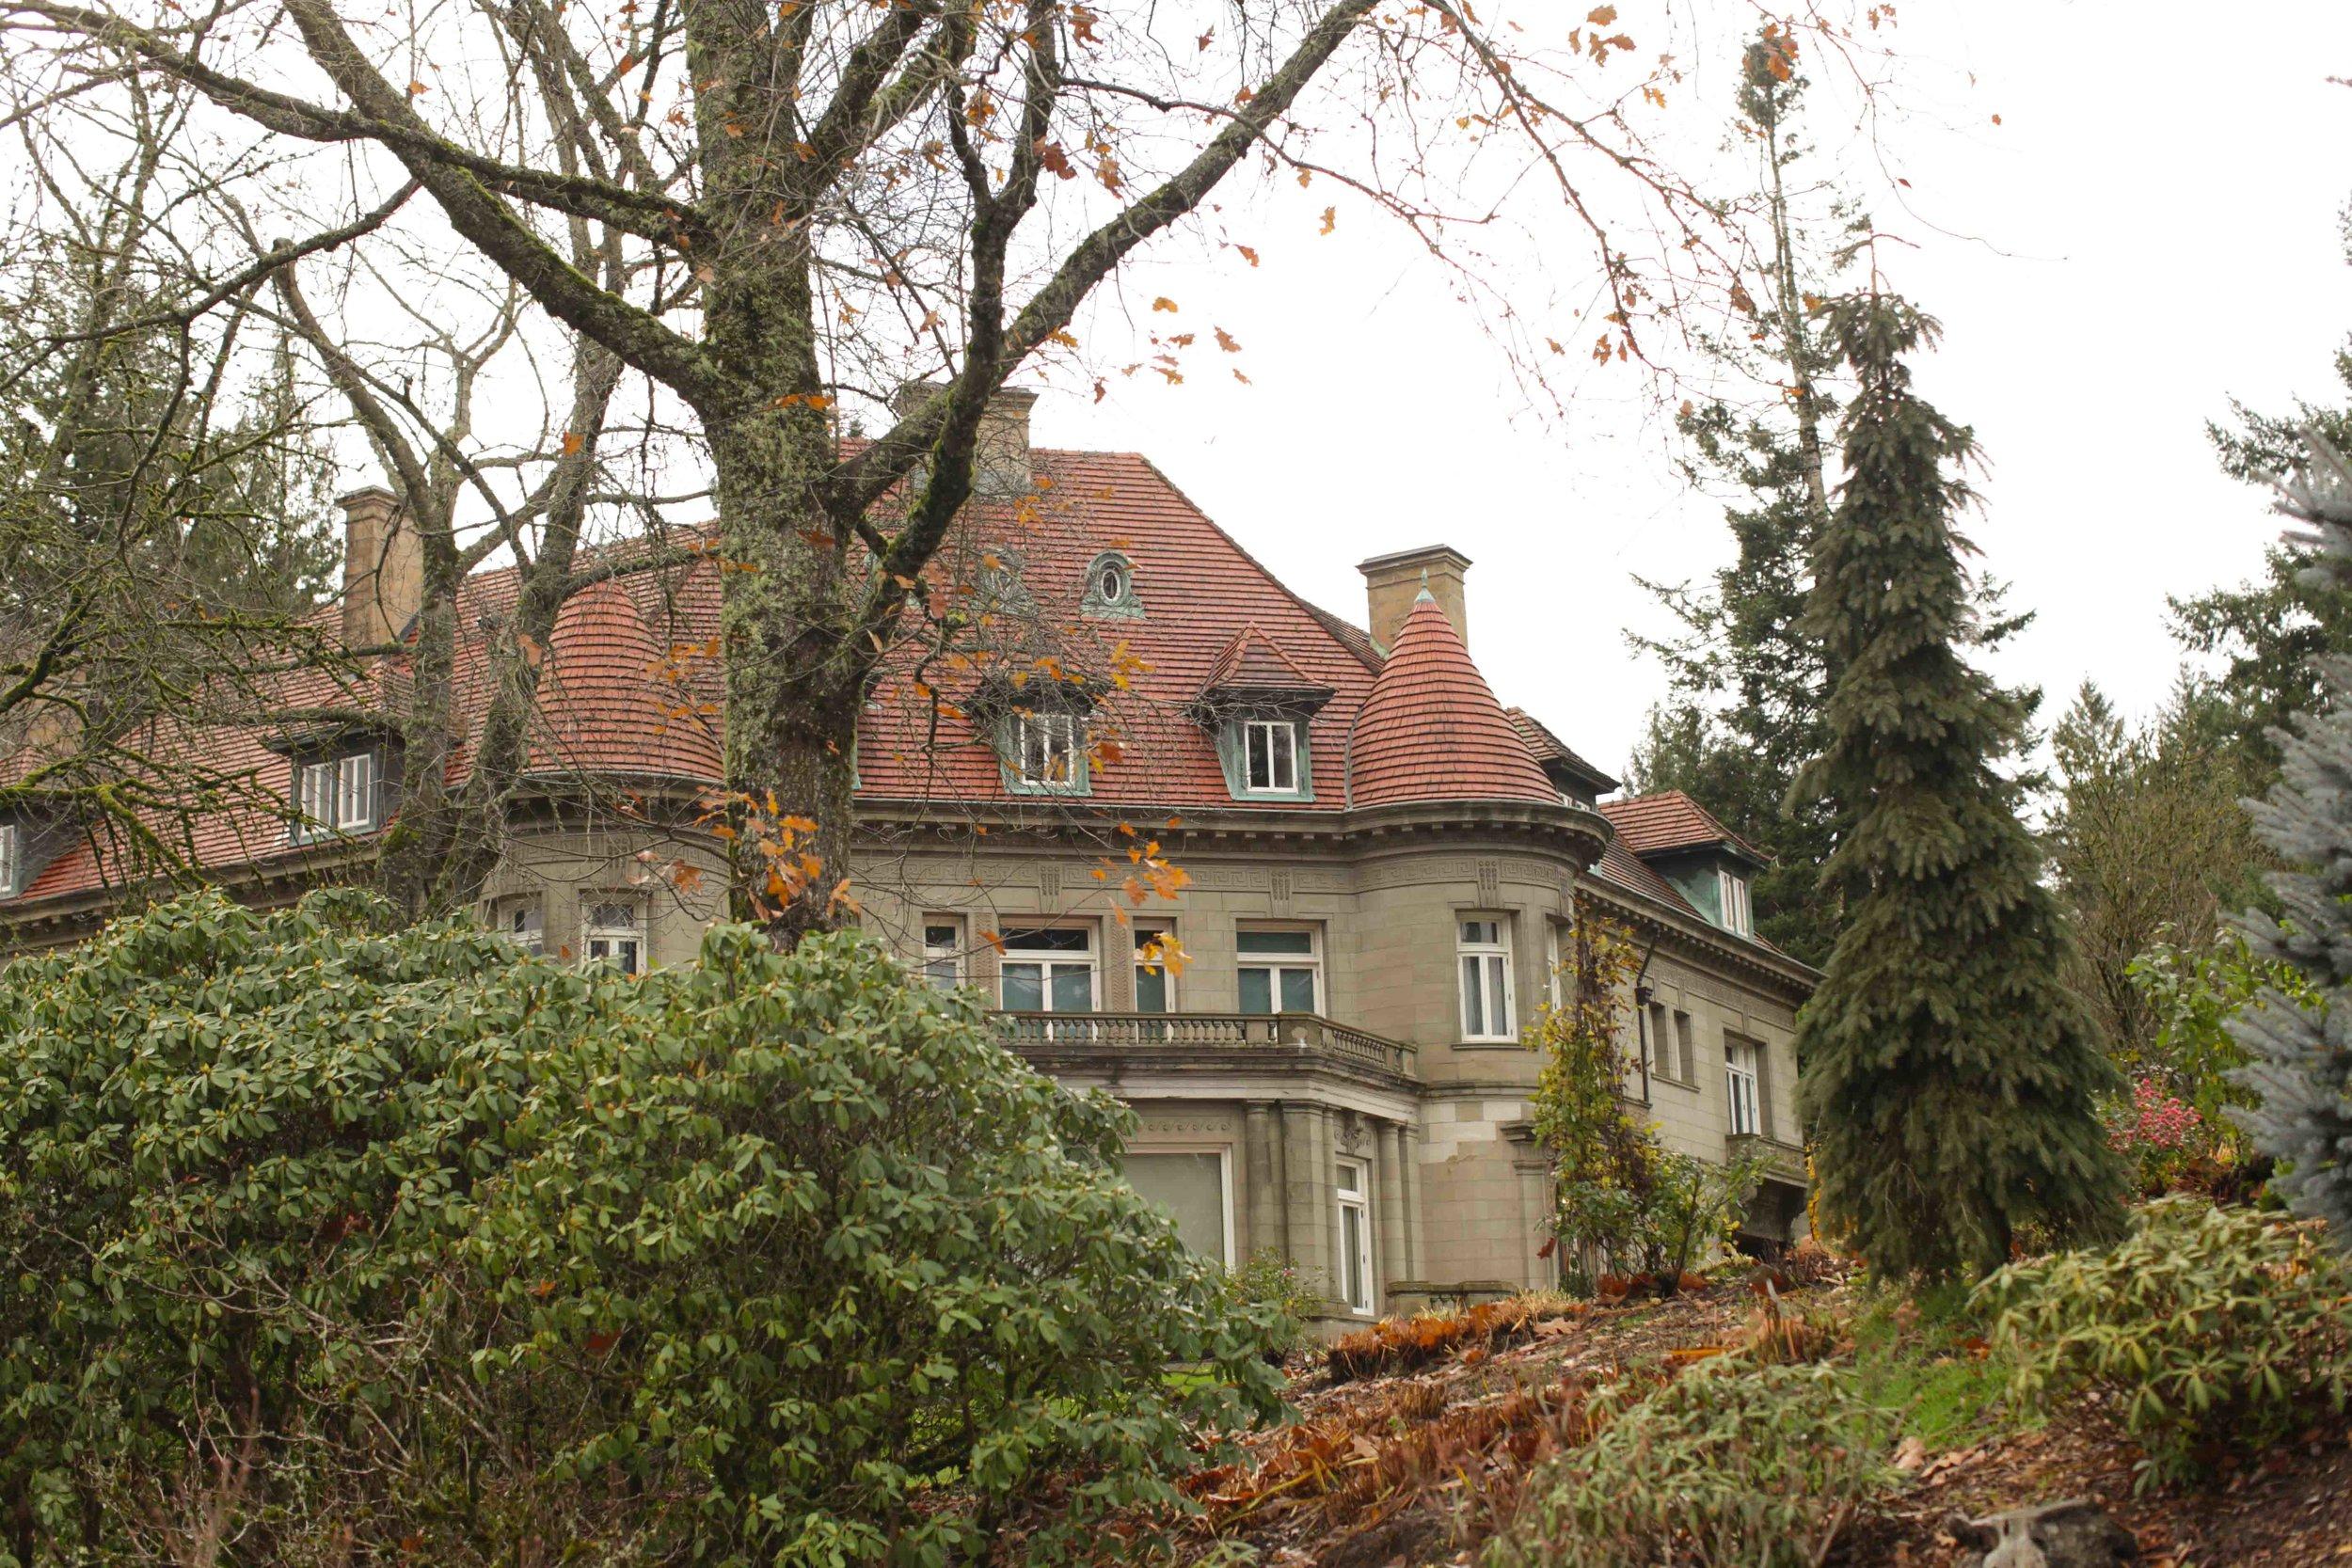 The Pittock Mansion